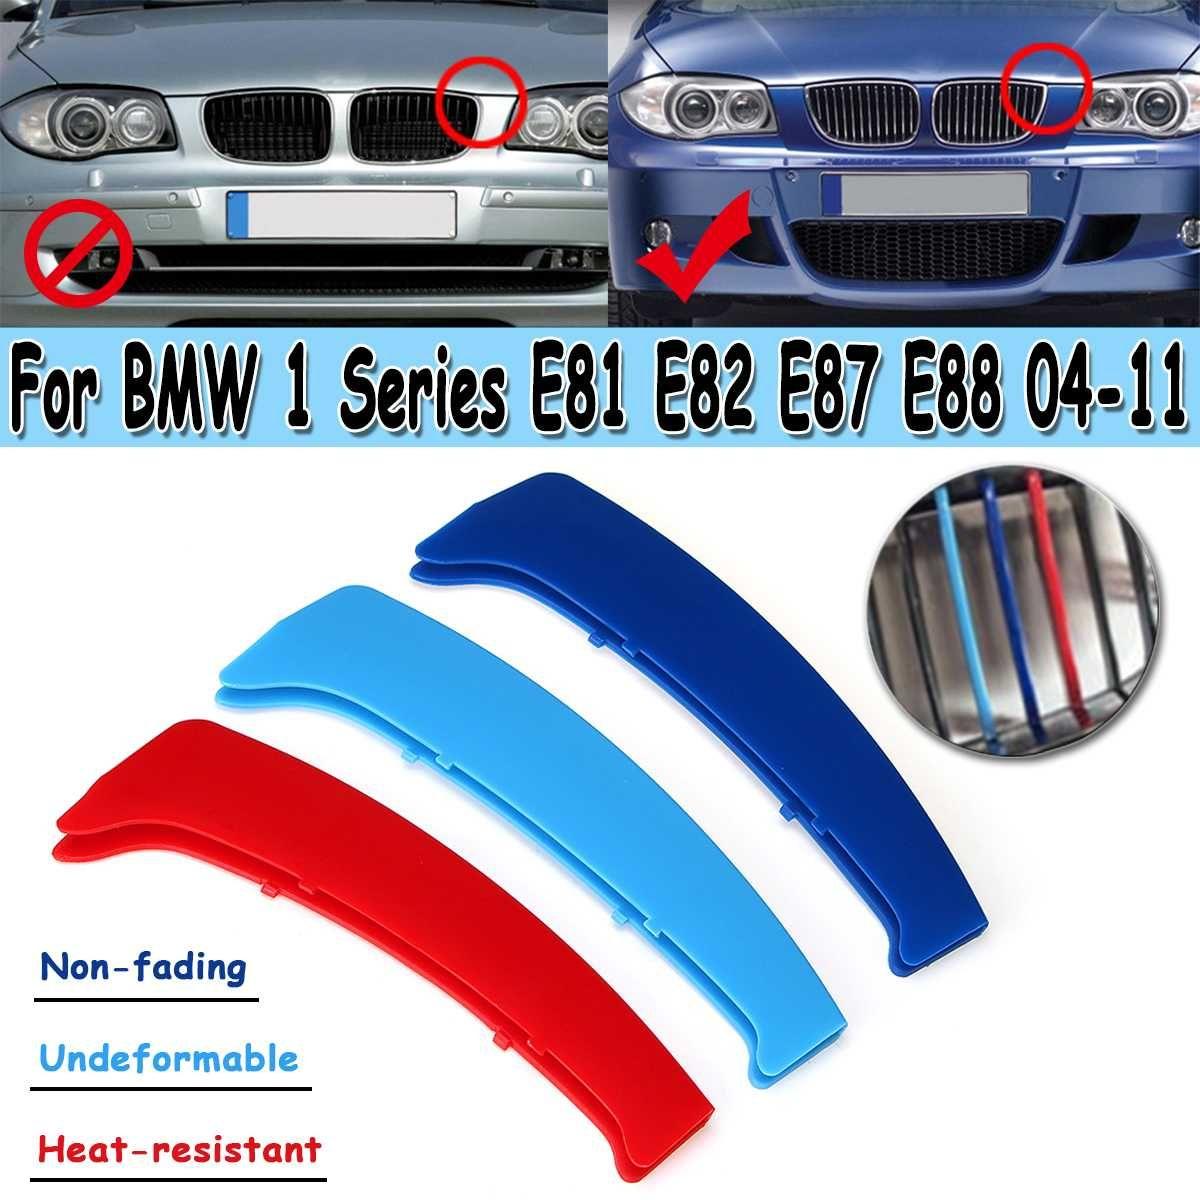 E81 HANDBRAKE LEVER BMW 1 SERIES REF#1 E87